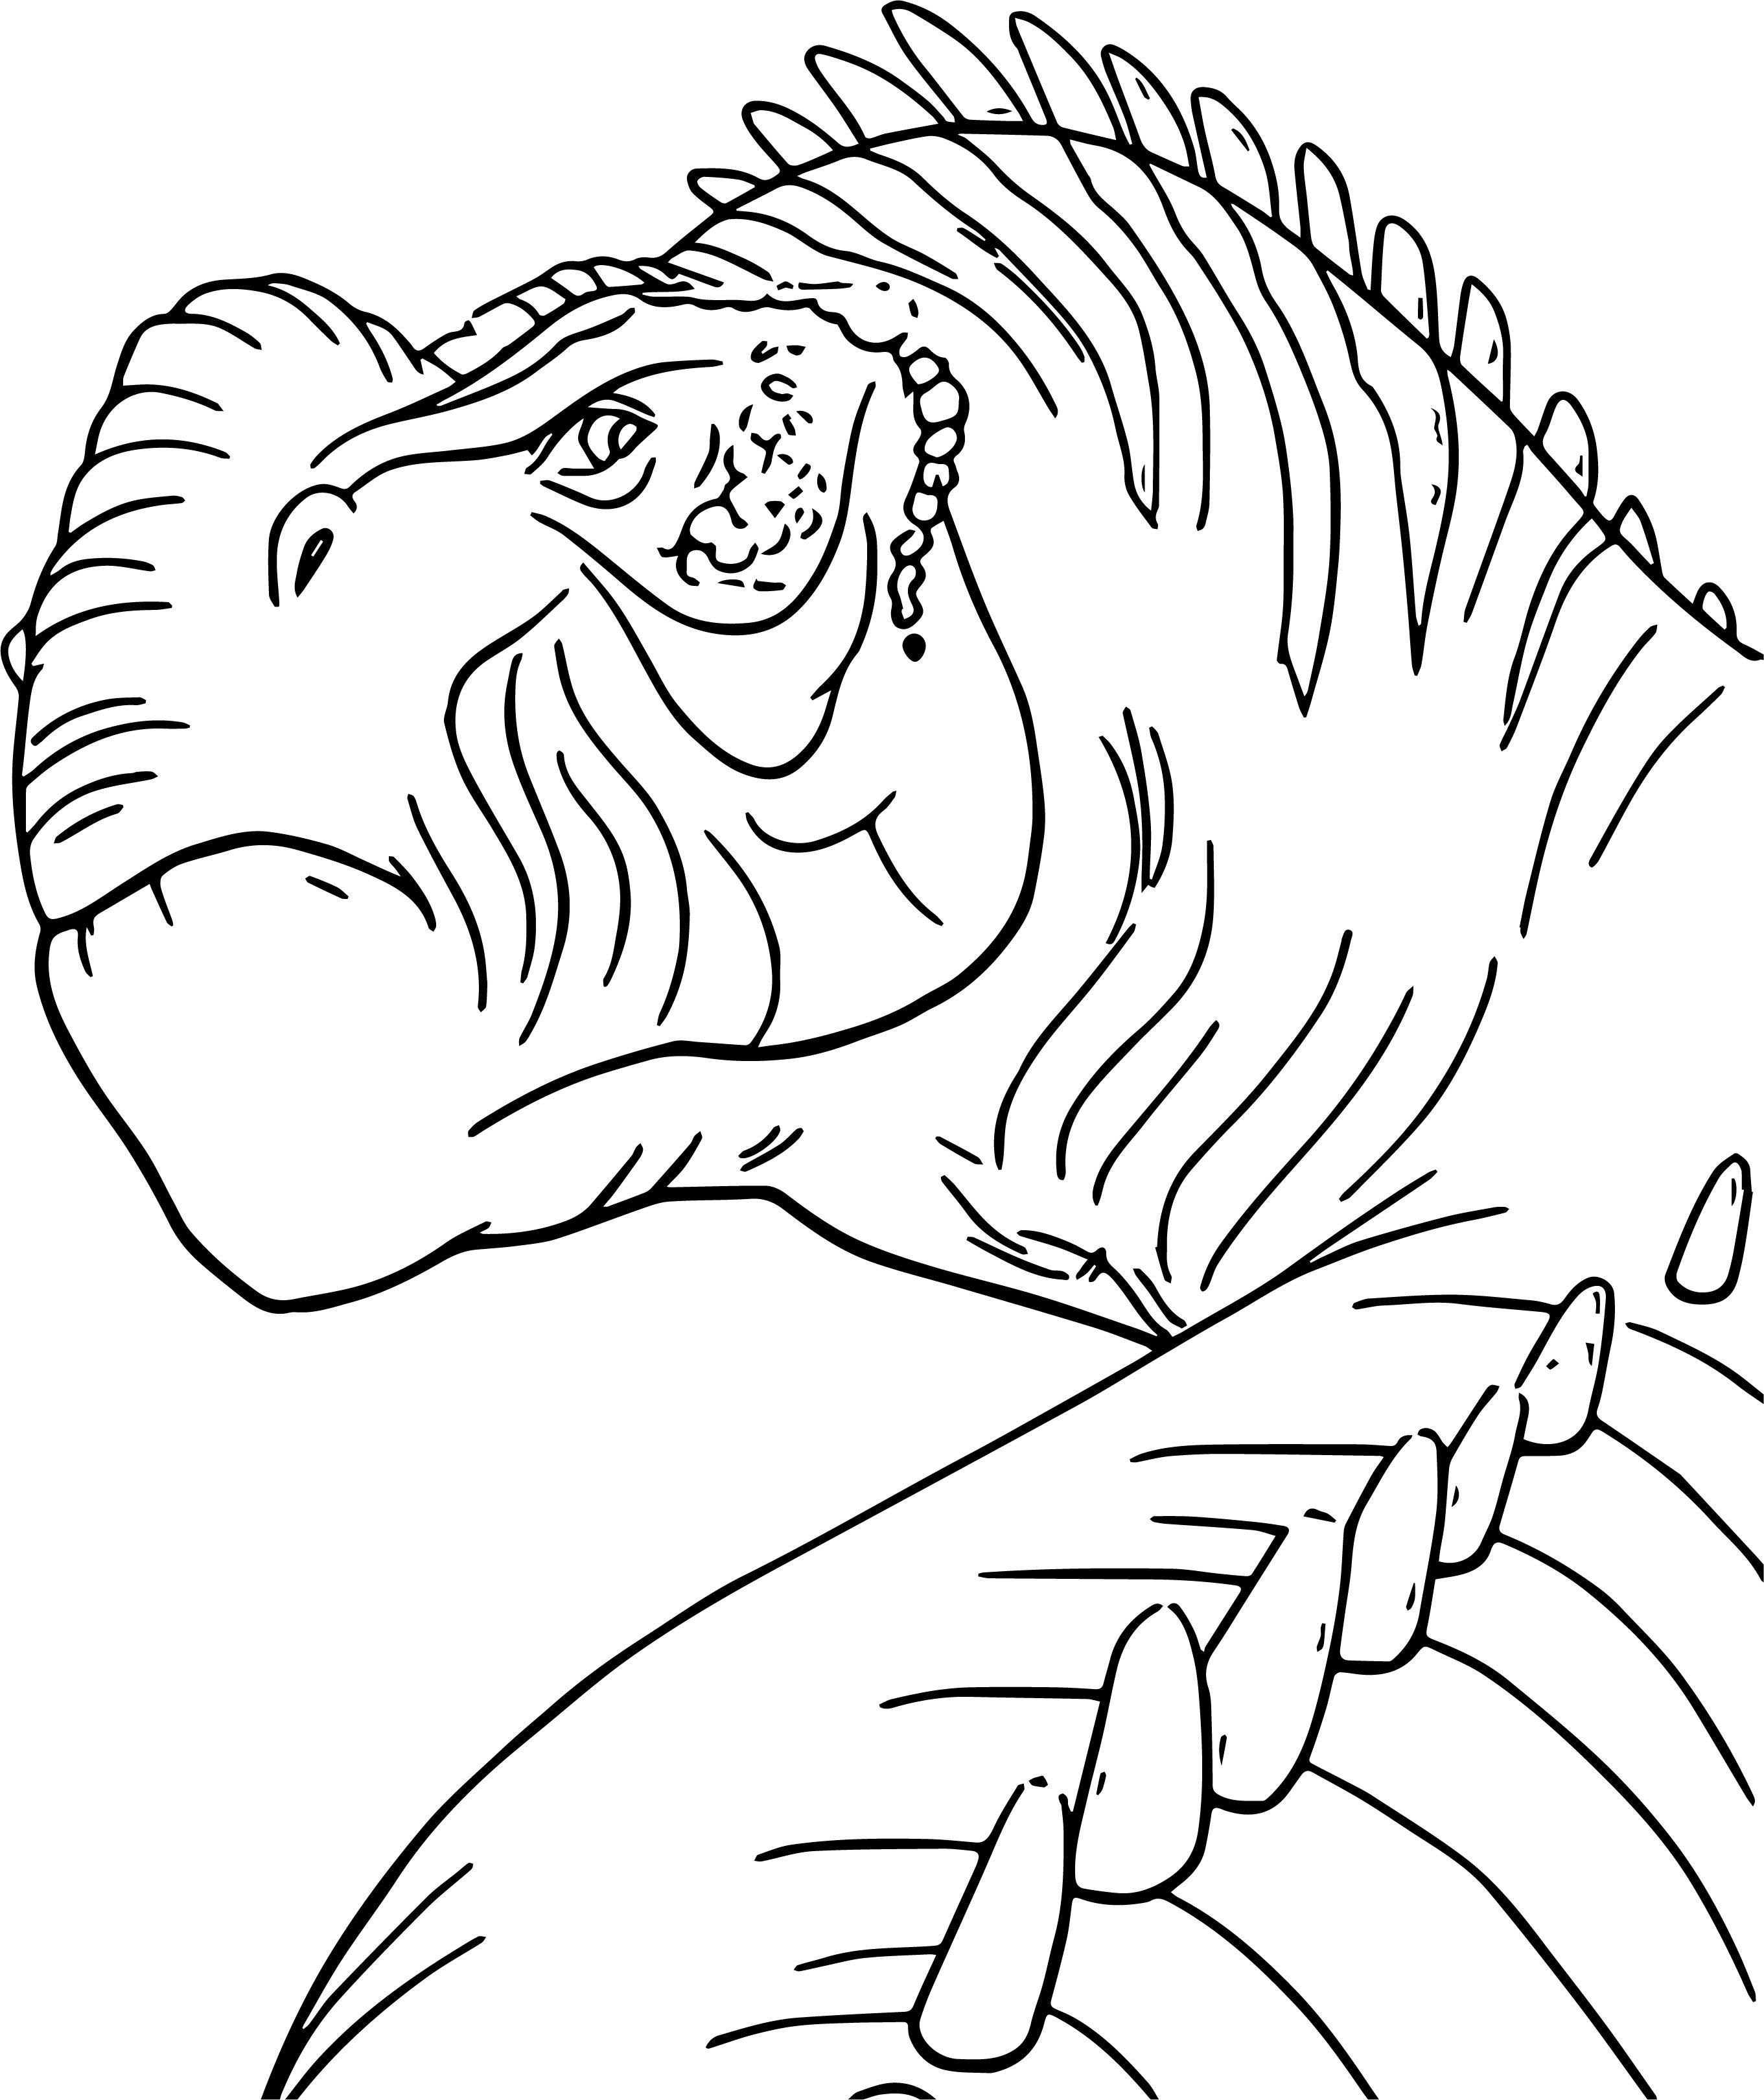 disney dinosaur coloring pages | Kron Dinosaur Coloring Page | Wecoloringpage.com